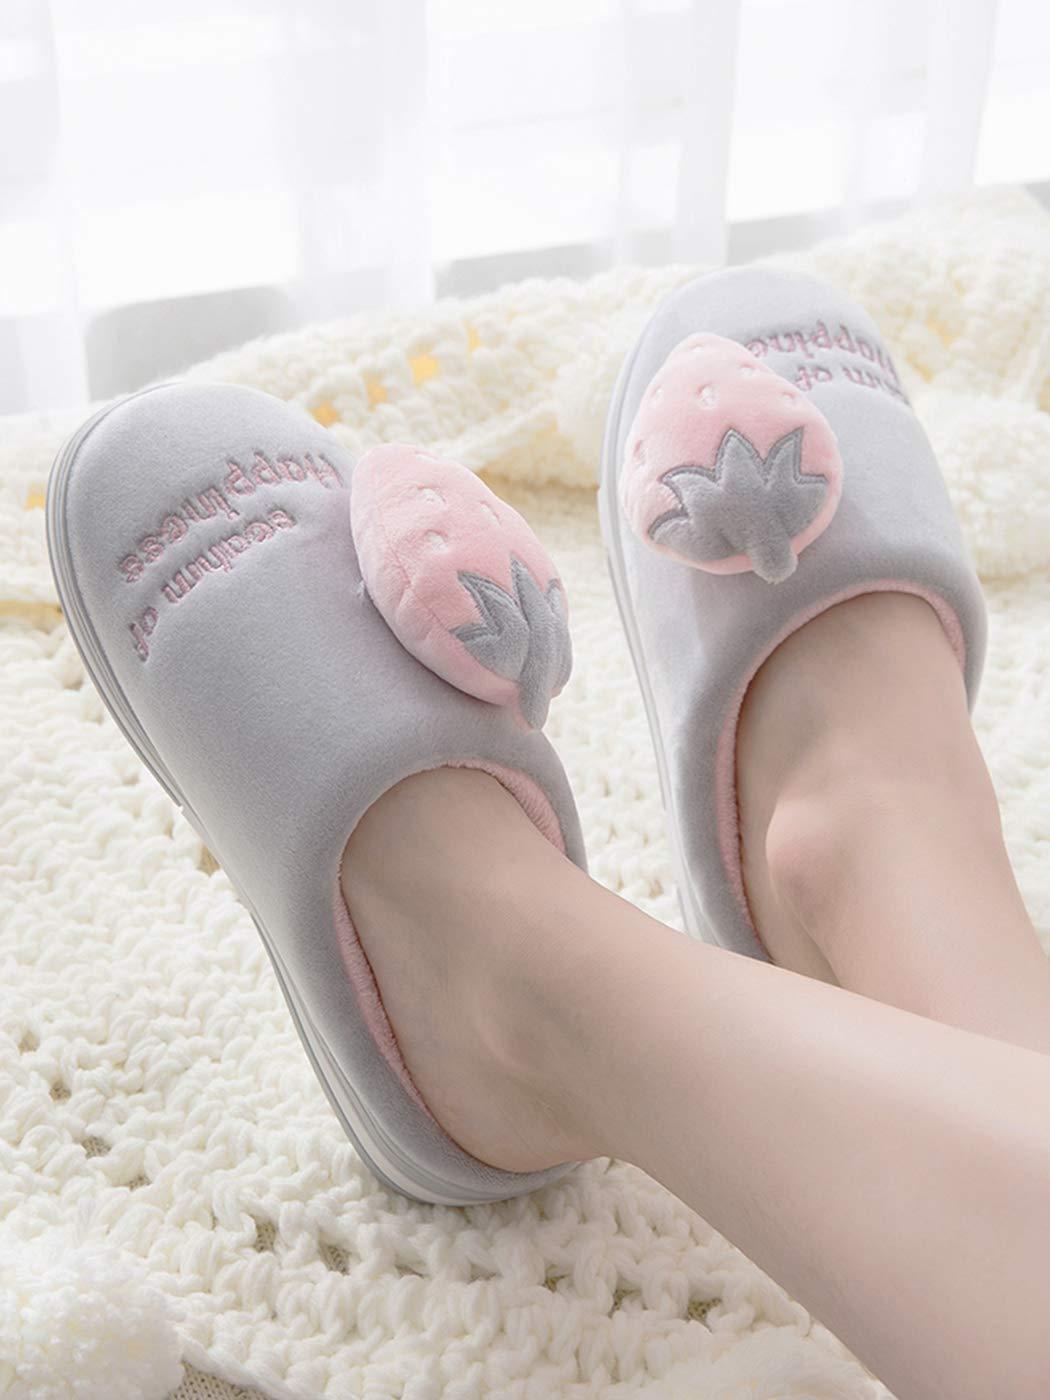 Nafanio Winter Women Home Slippers Strawberry Fashion Warm Shoes Woman Slip on Female Slides Black Pink Flats